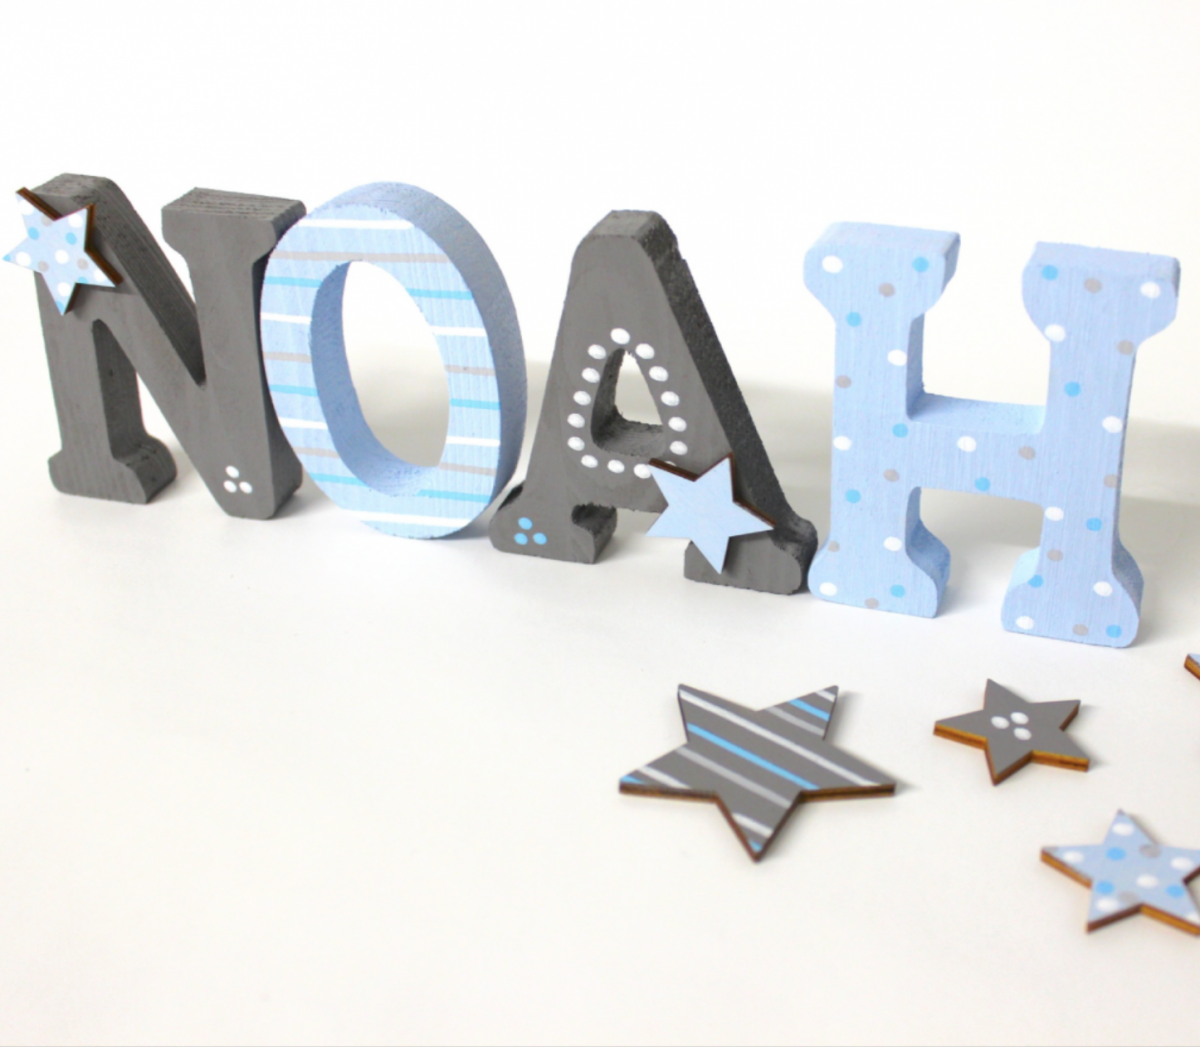 Holzbuchstaben Kinderzimmer Holzbuchstaben kinderzimmer